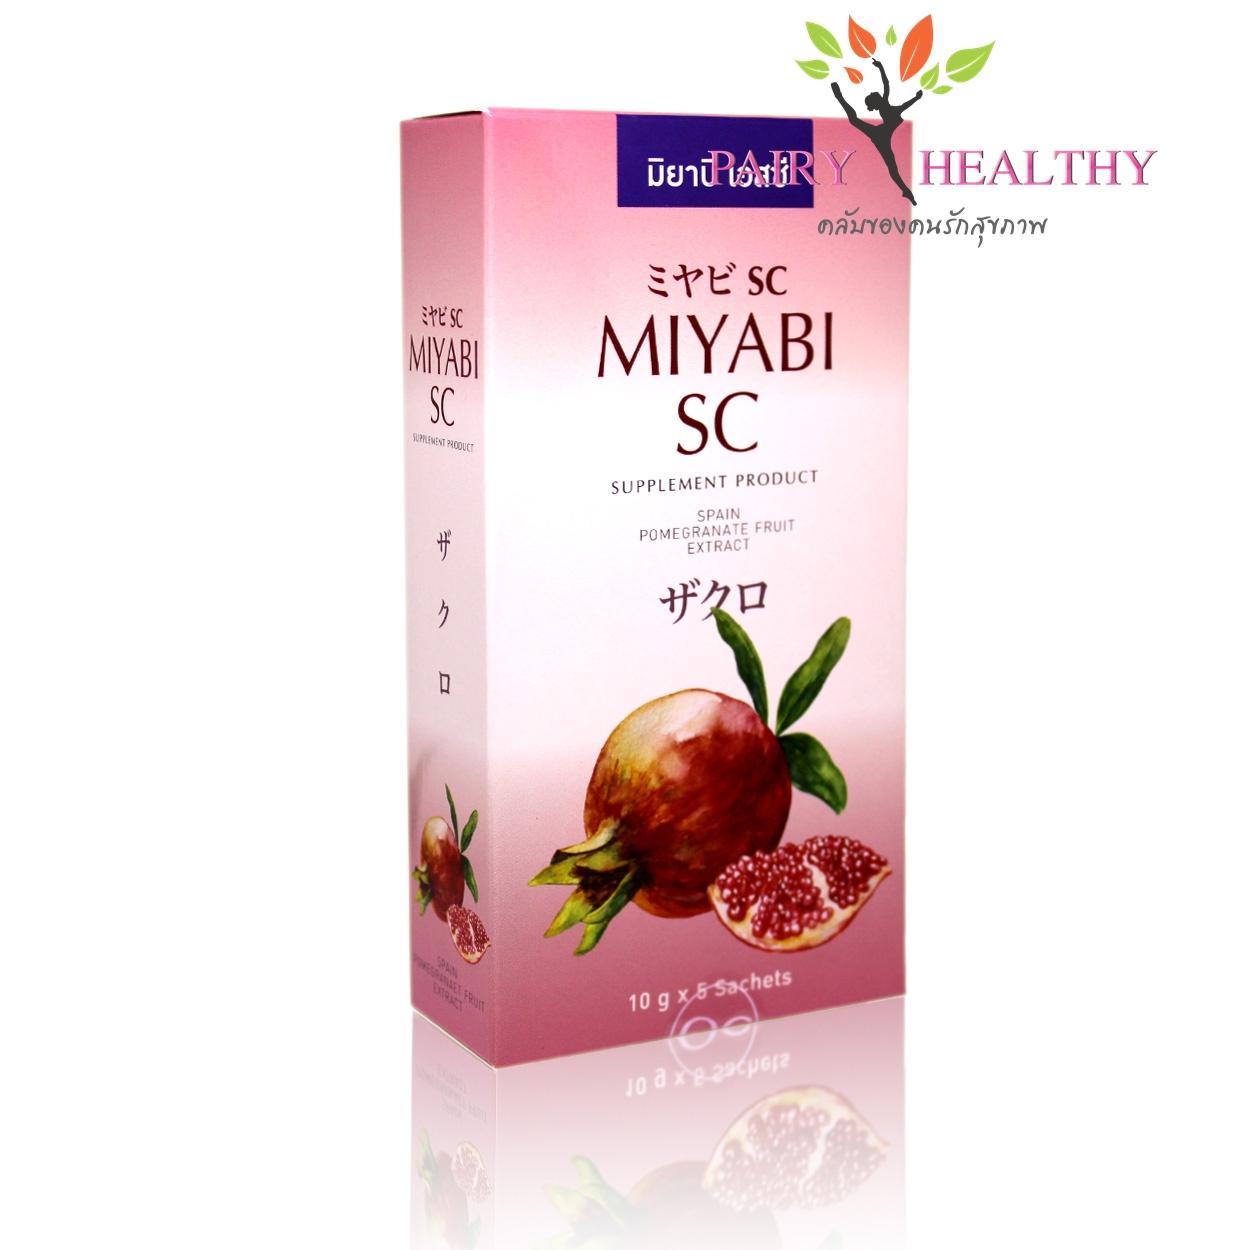 MIYABI SC มิยาบิคอลลาเจน ขนาด 5 ซอง/กล่อง ส่งฟรี ลงทะเบียน